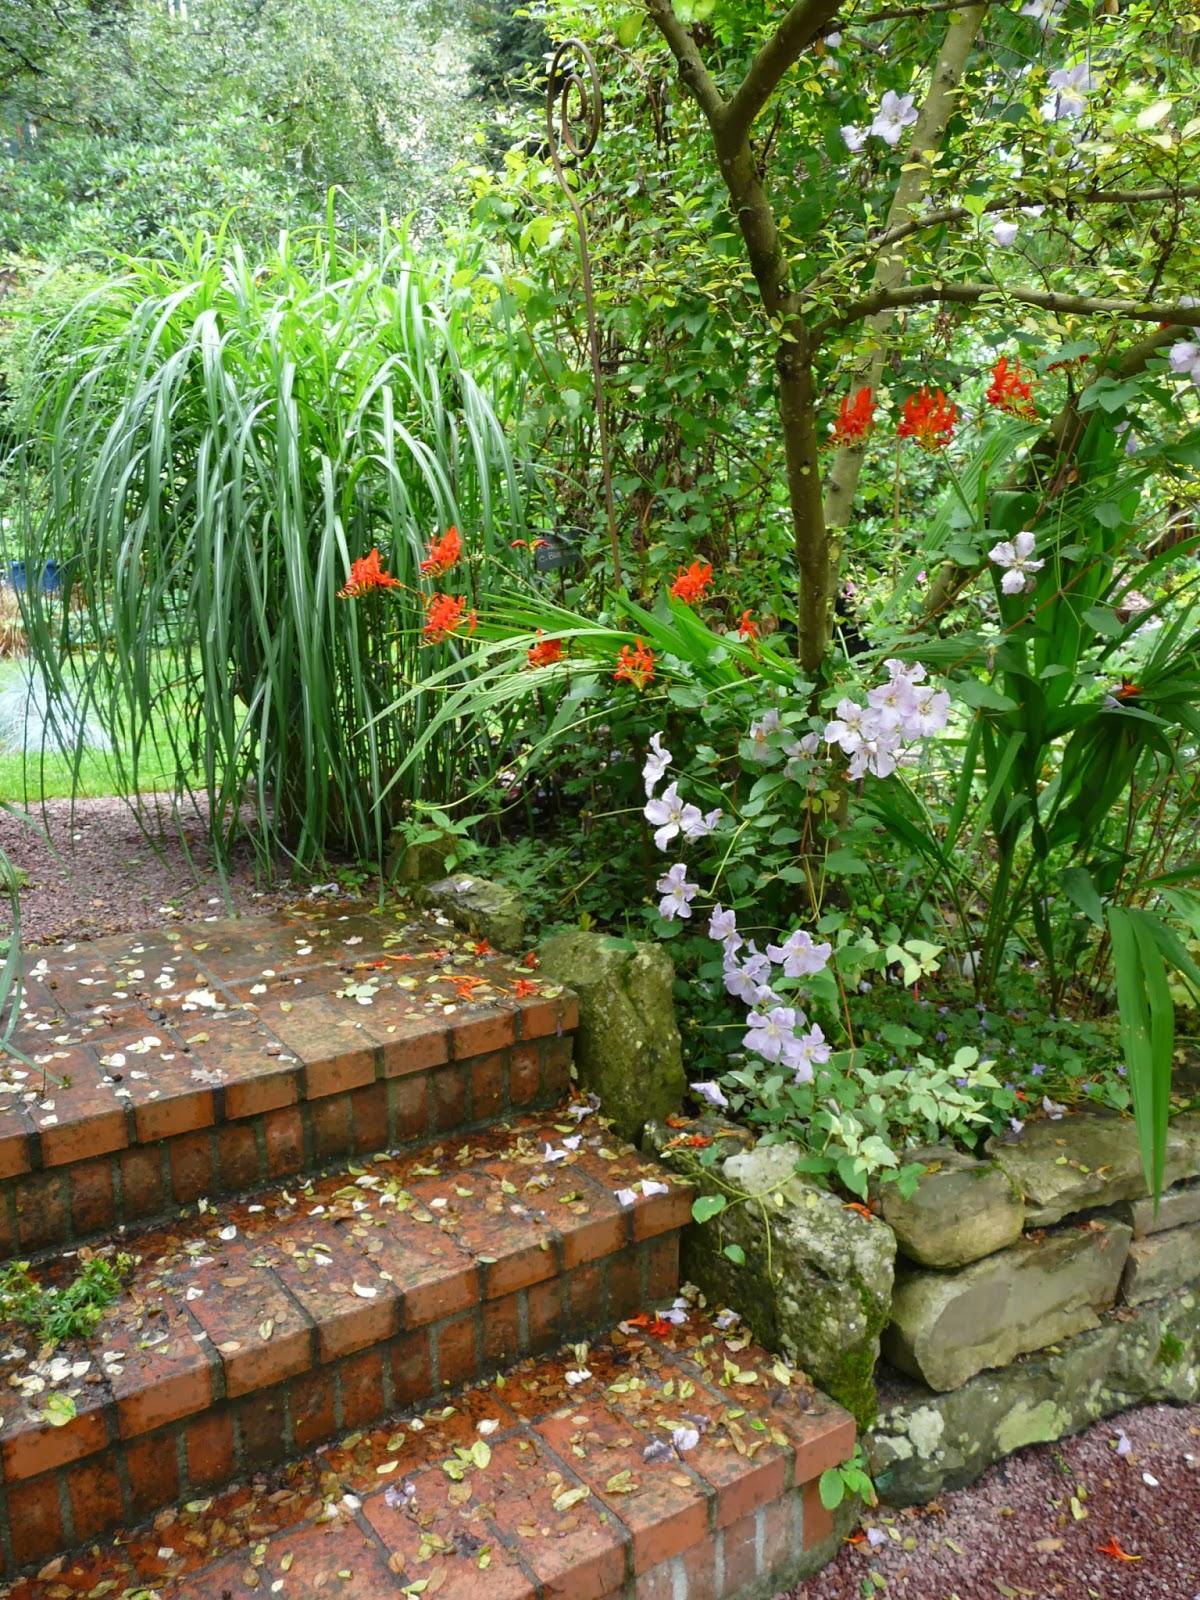 carnet de balades dans l 39 orne en normandie le jardin retir bagnole de l 39 orne. Black Bedroom Furniture Sets. Home Design Ideas